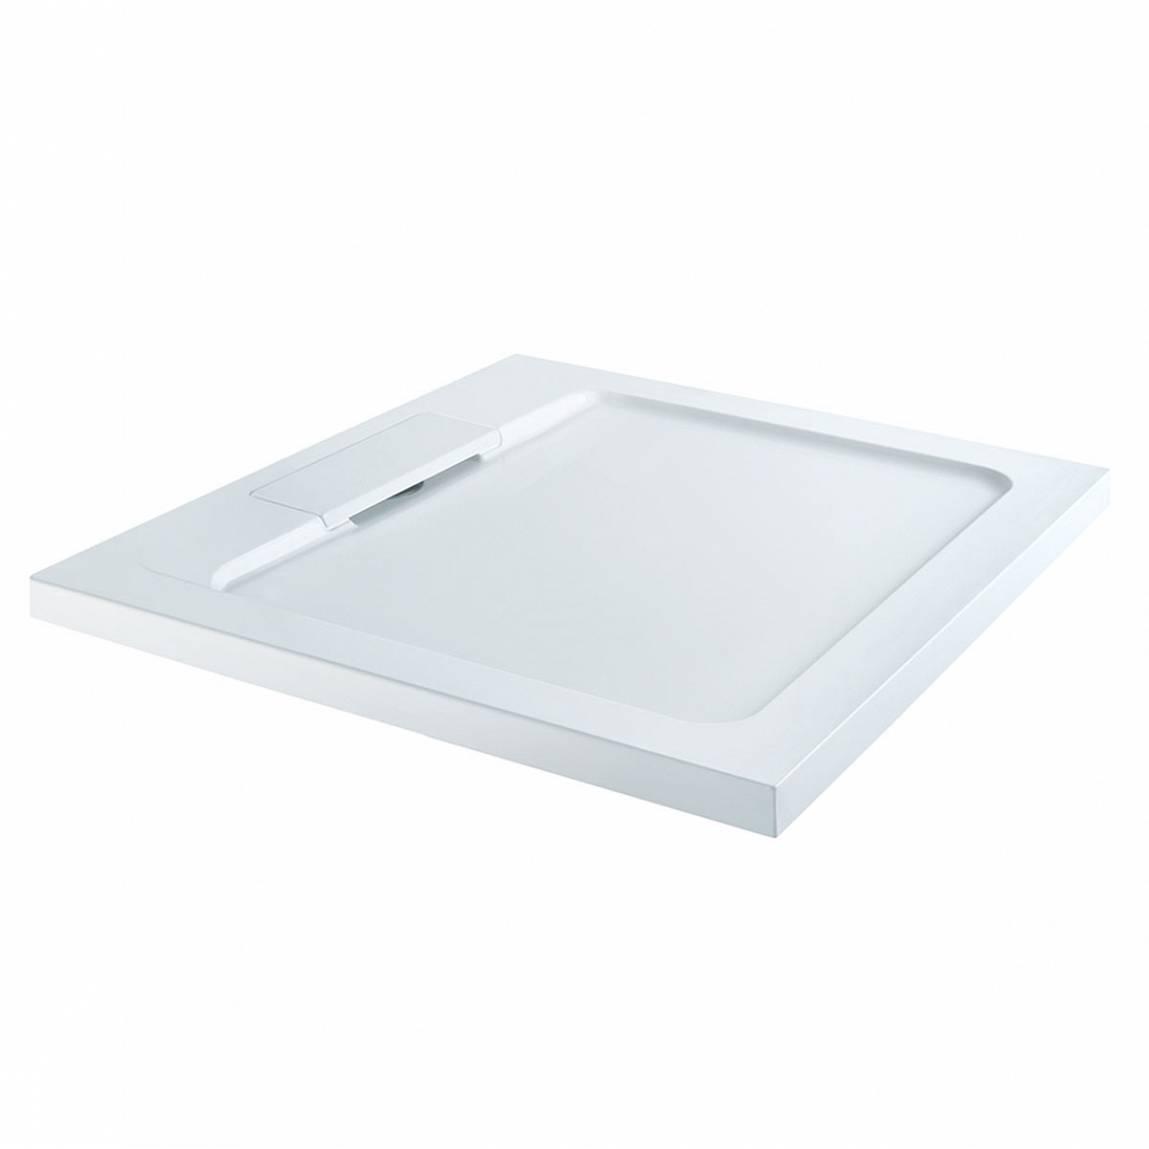 Image of Designer Square Stone Shower Tray 800 x 800